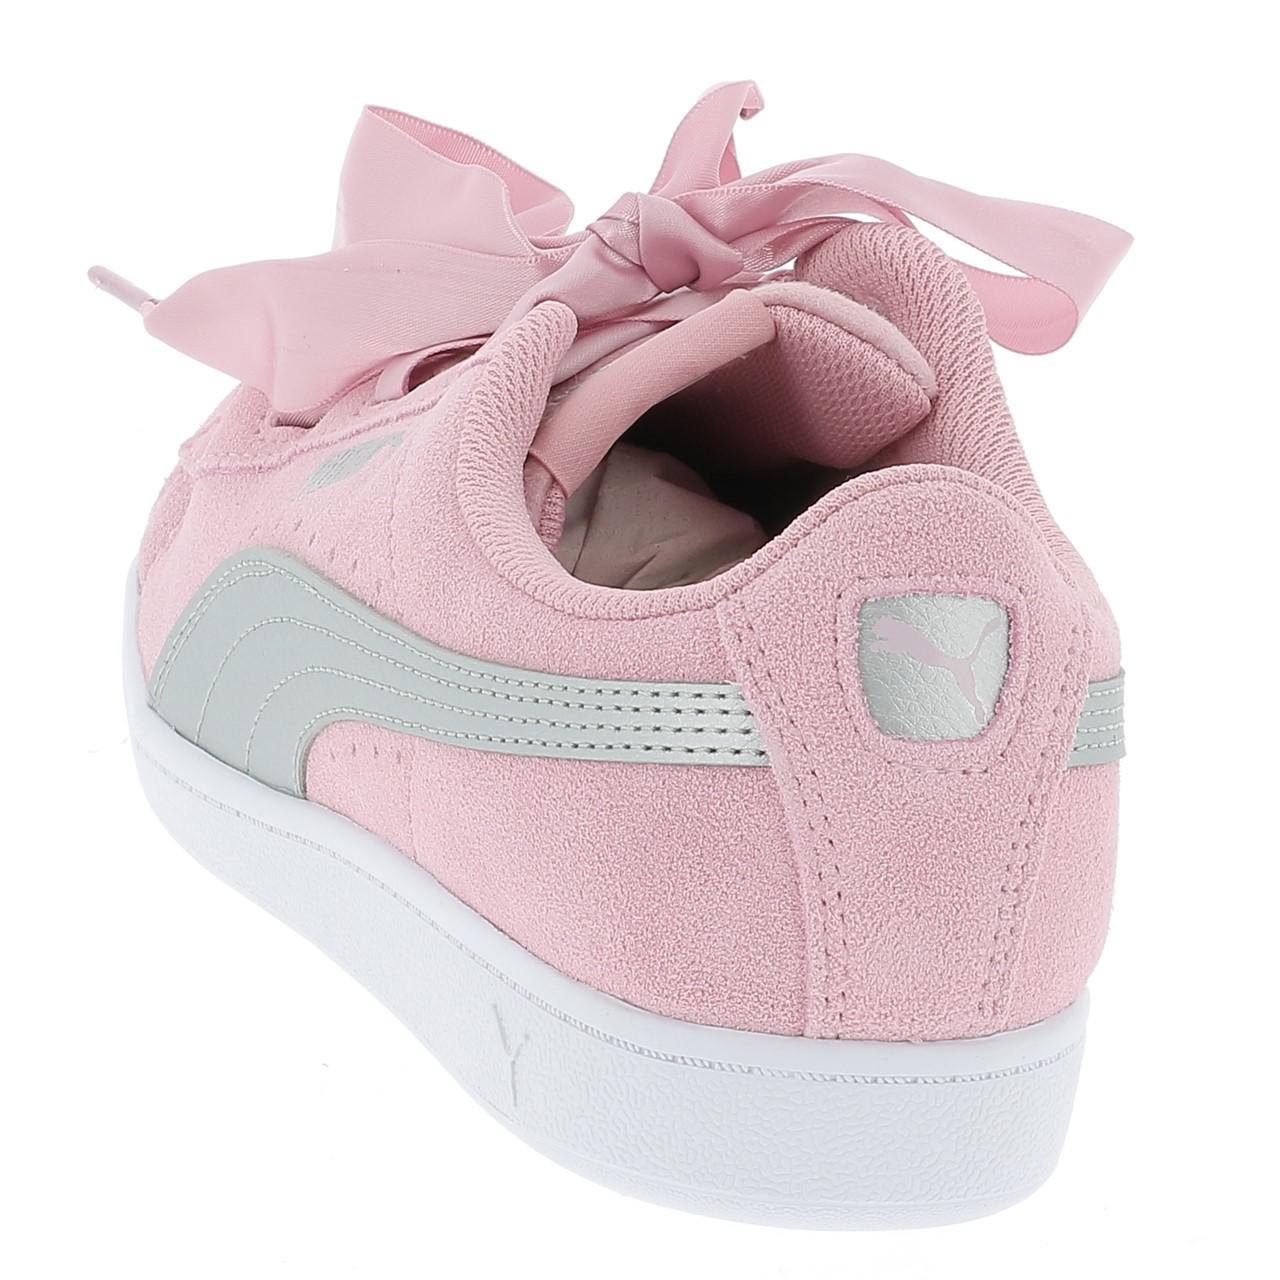 Schuhe-Niedrig-Leder-oder-Faux-Puma-Vikky-Band-Rosa-Maedchen-Rosa-17056-Neu Indexbild 3